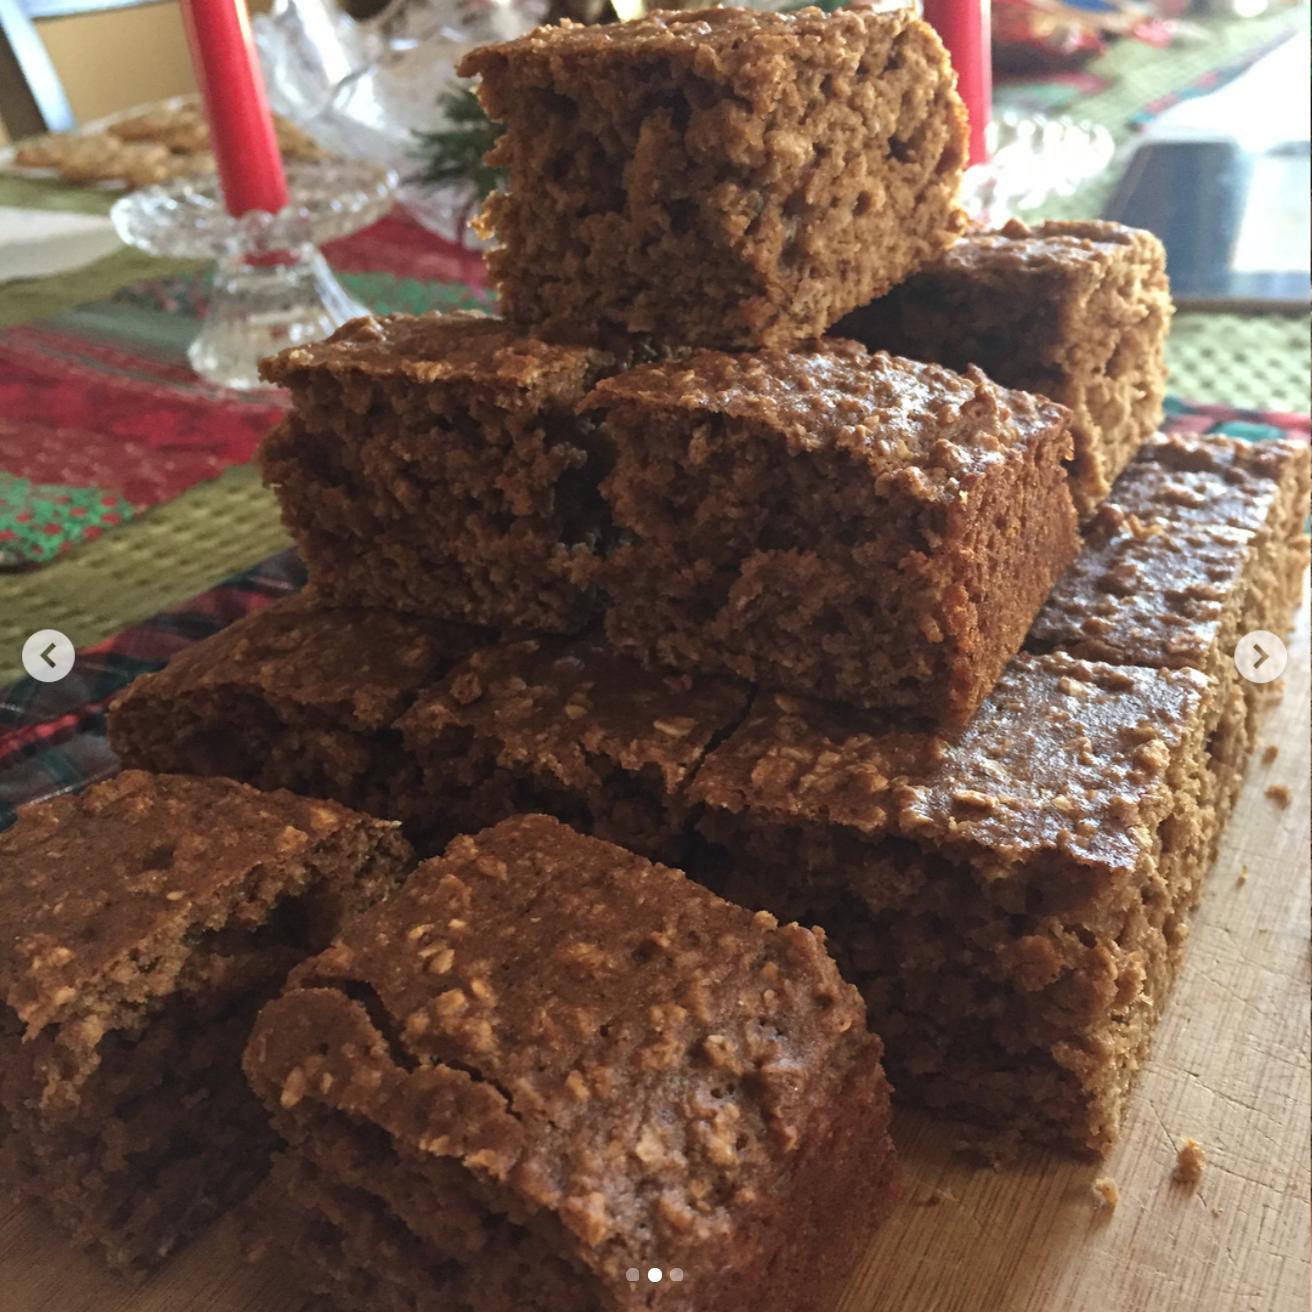 healthy gingerbread oatmeal snack cake by @janeska17